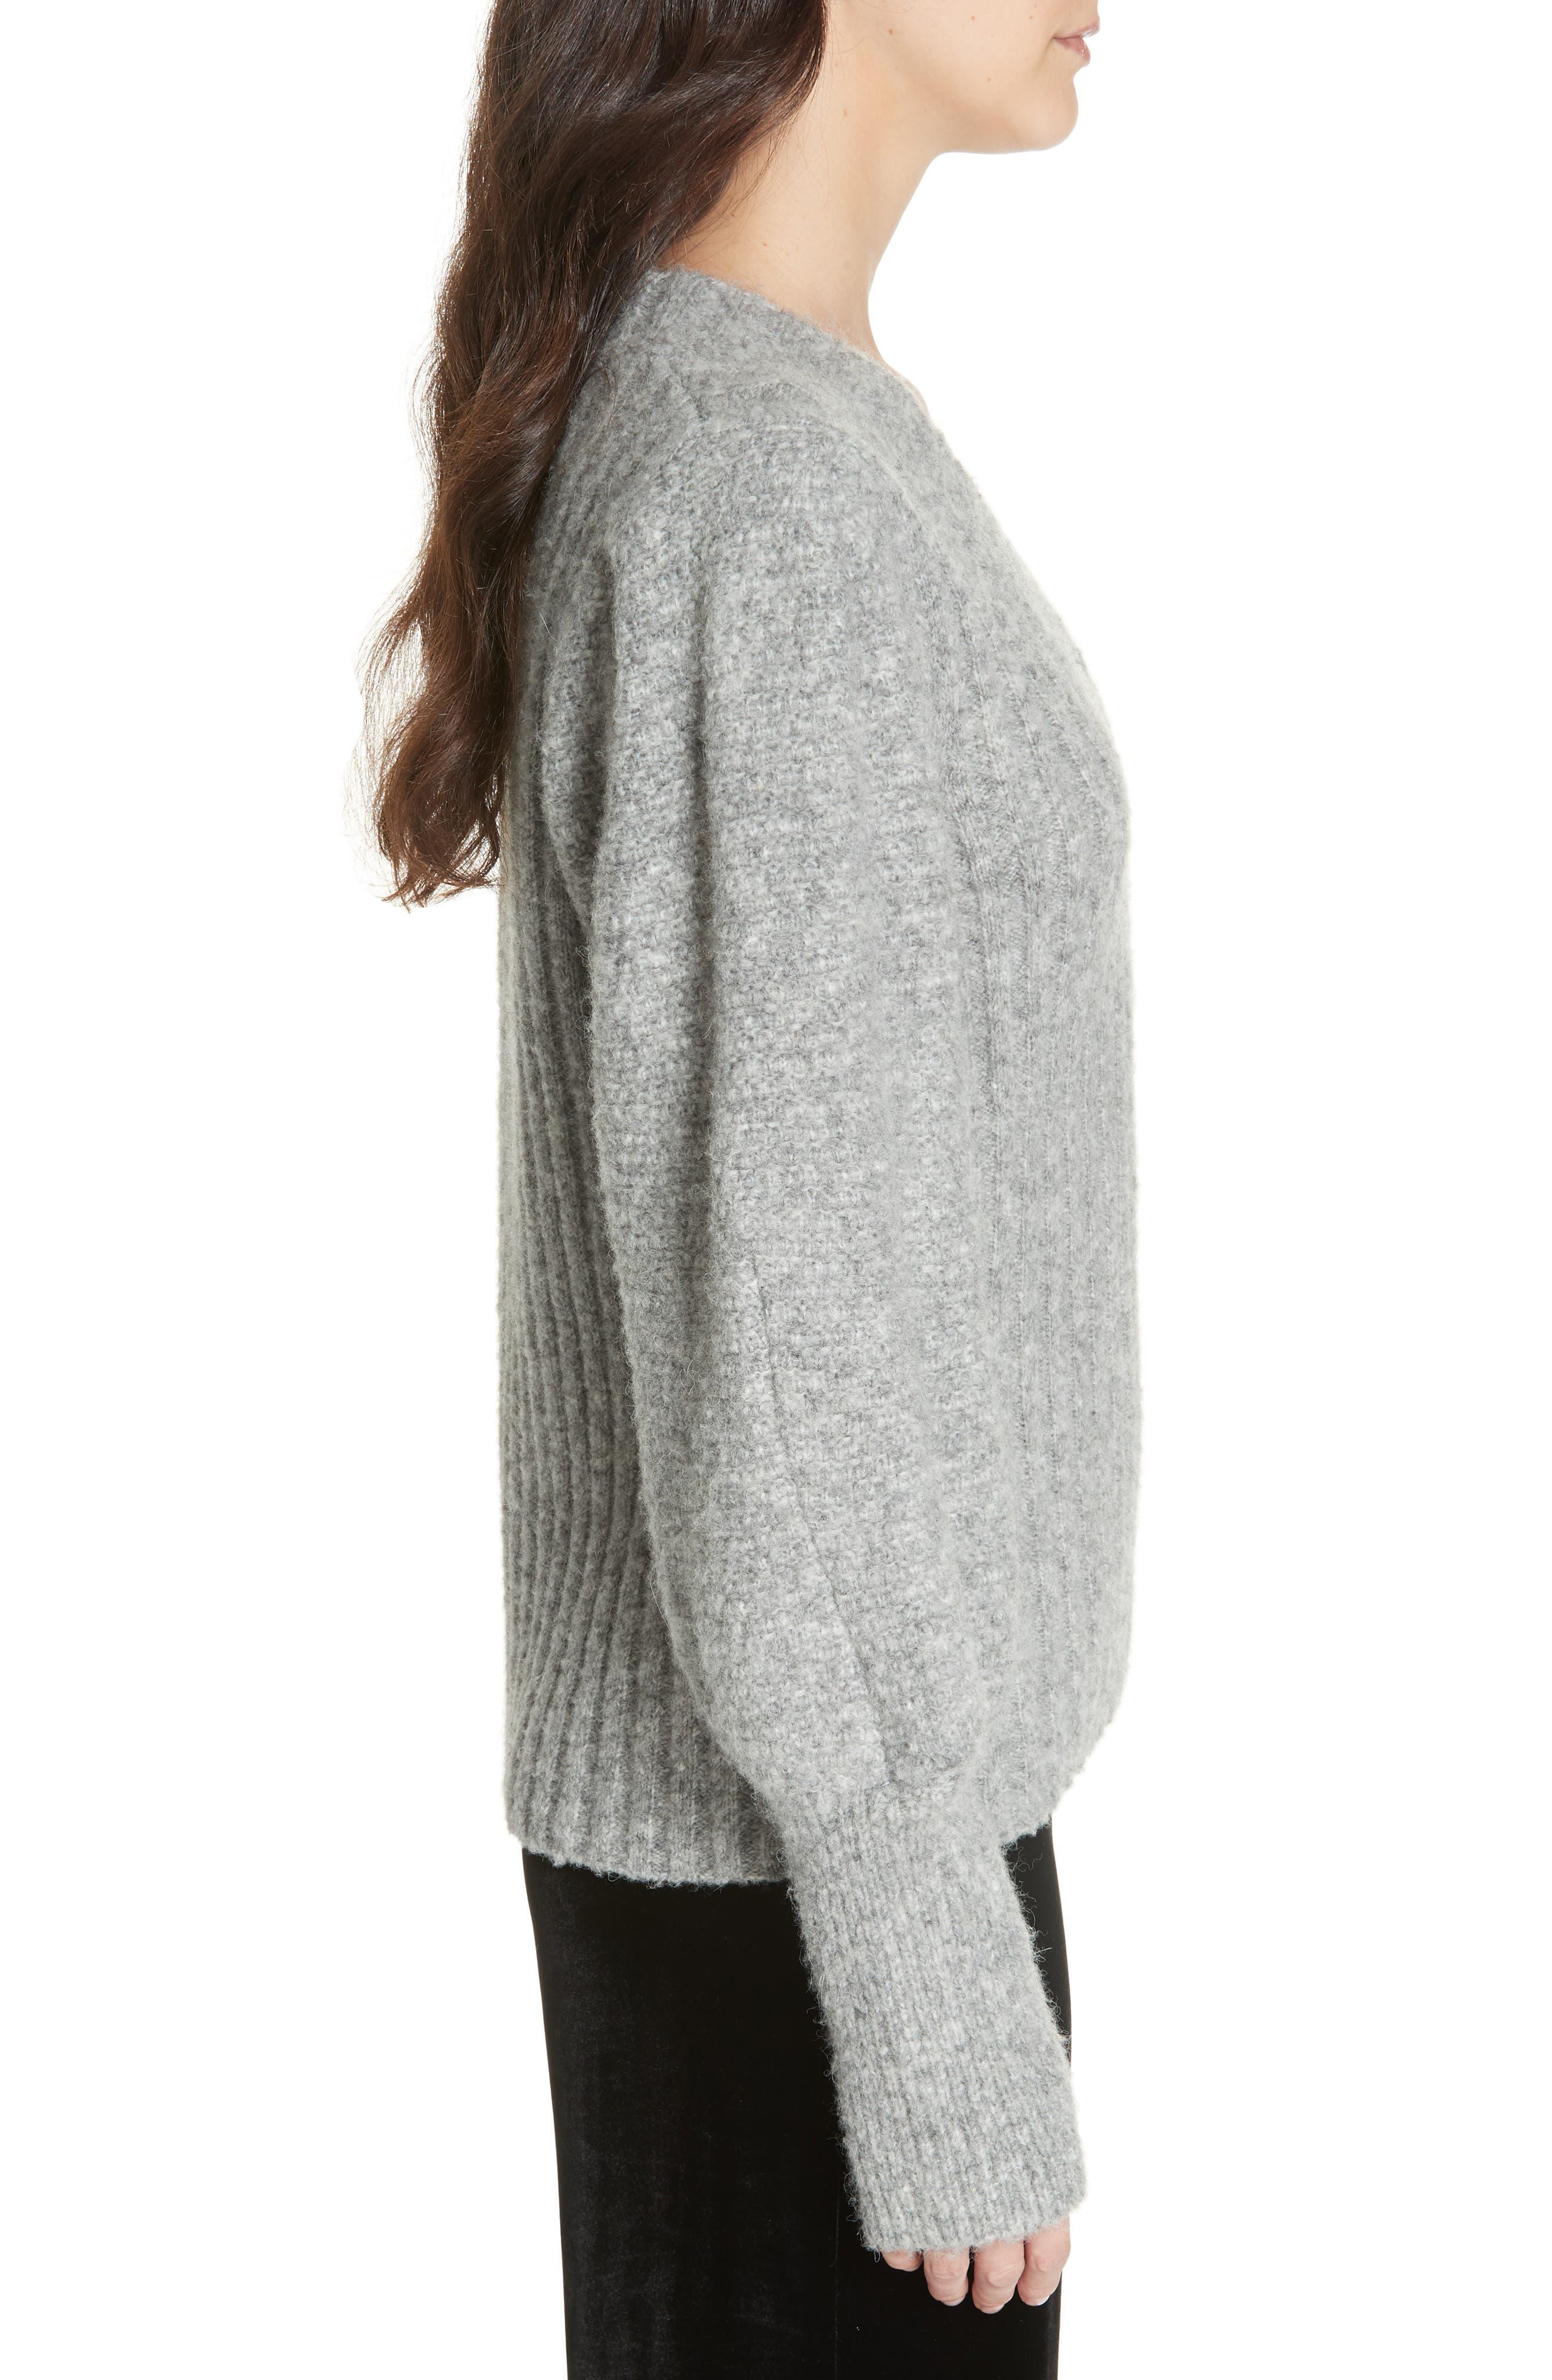 REBECCA TAYLOR,                             Lofty Alpaca Wool Blend Sweater,                             Alternate thumbnail 3, color,                             052